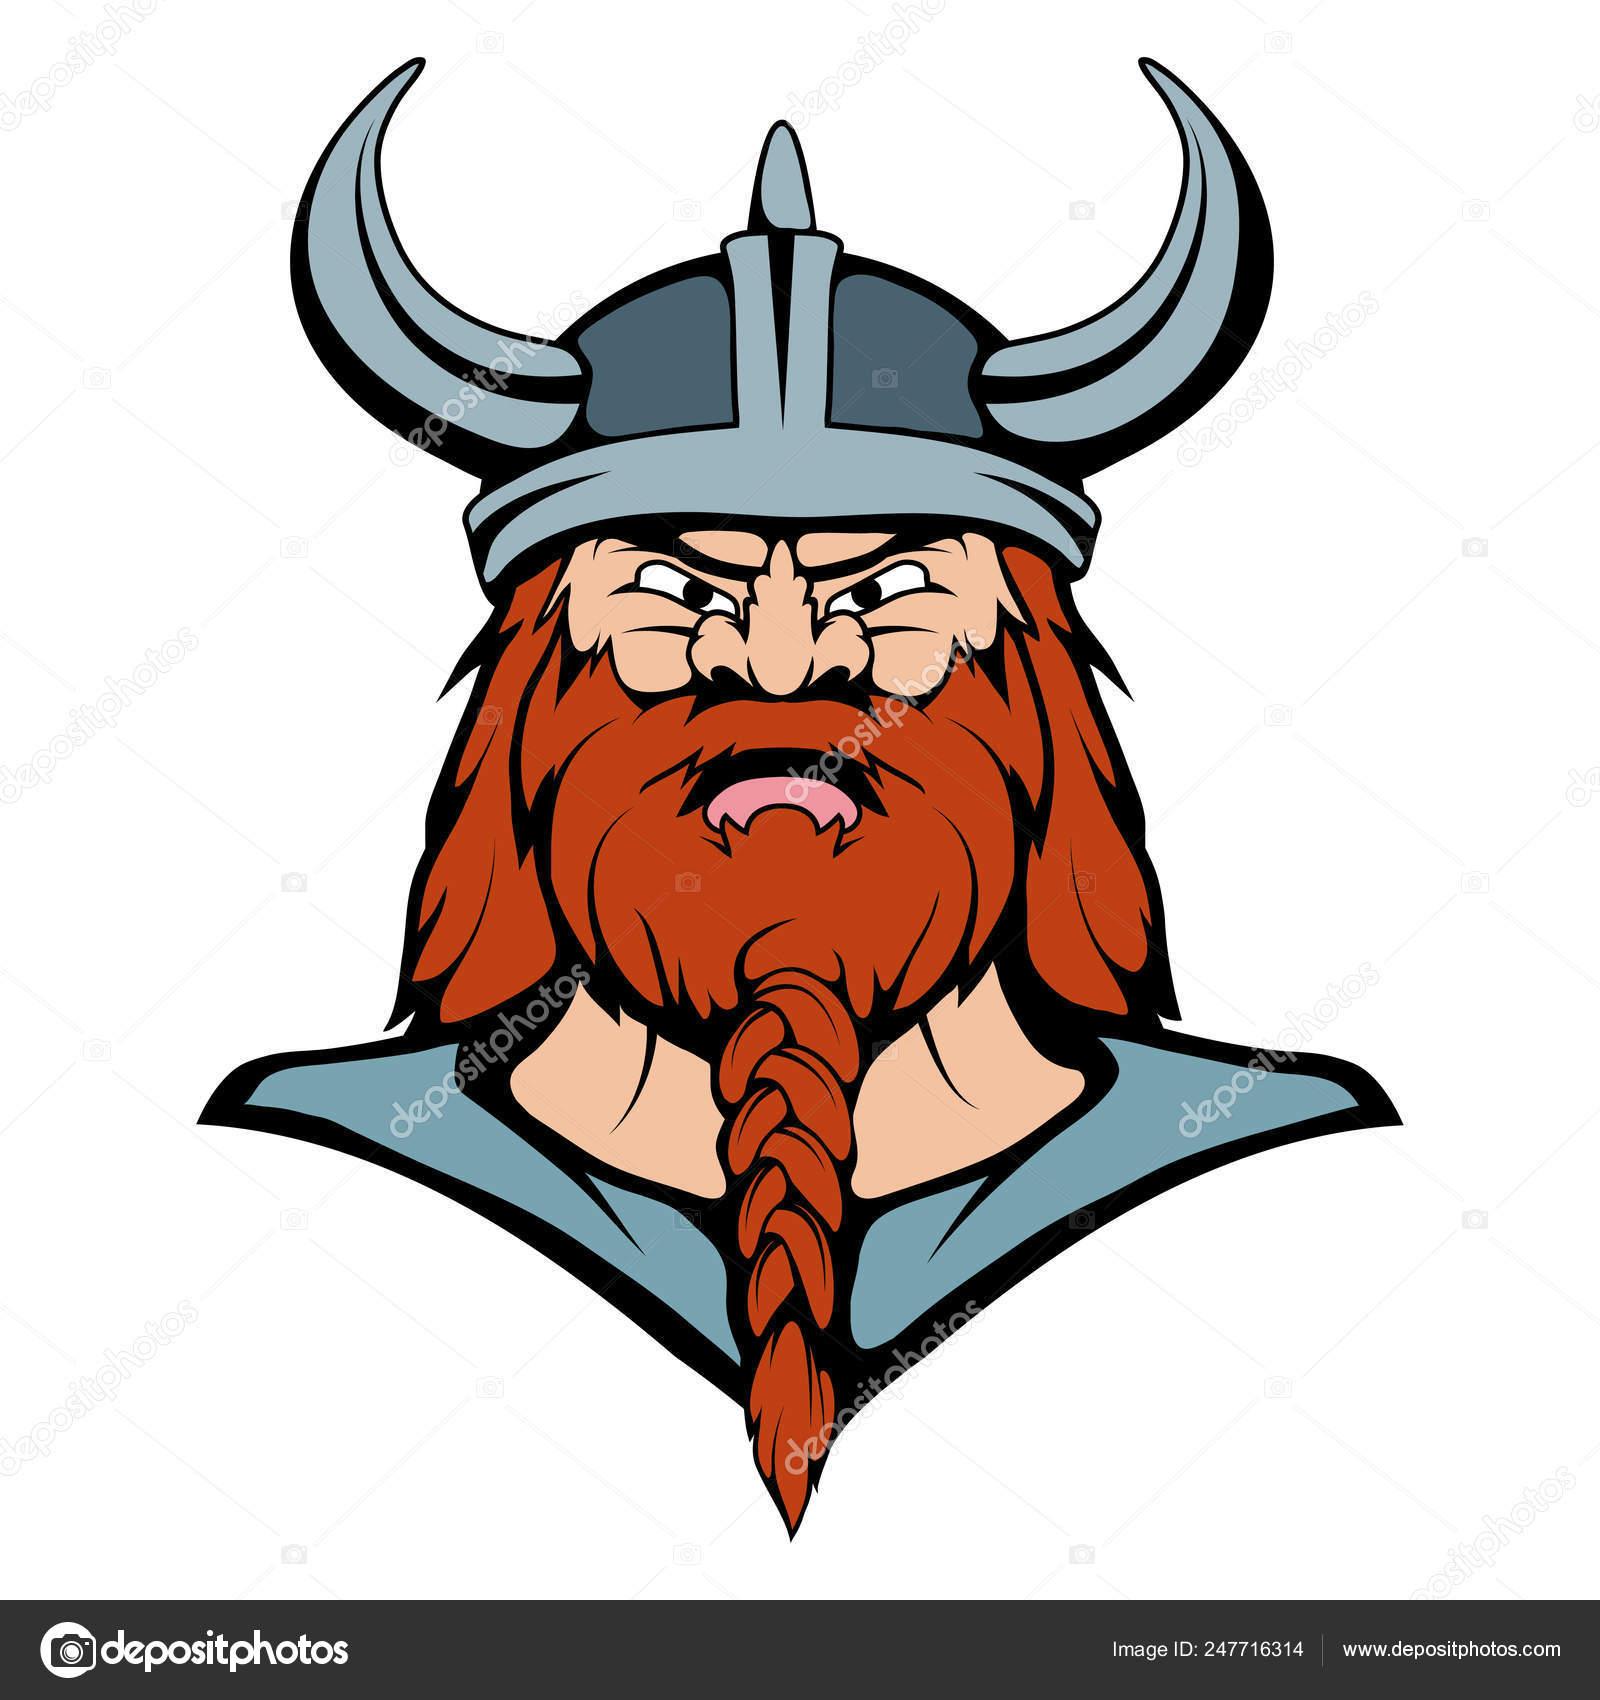 Viking Mascot Graphic, viking head suitable as logo for team